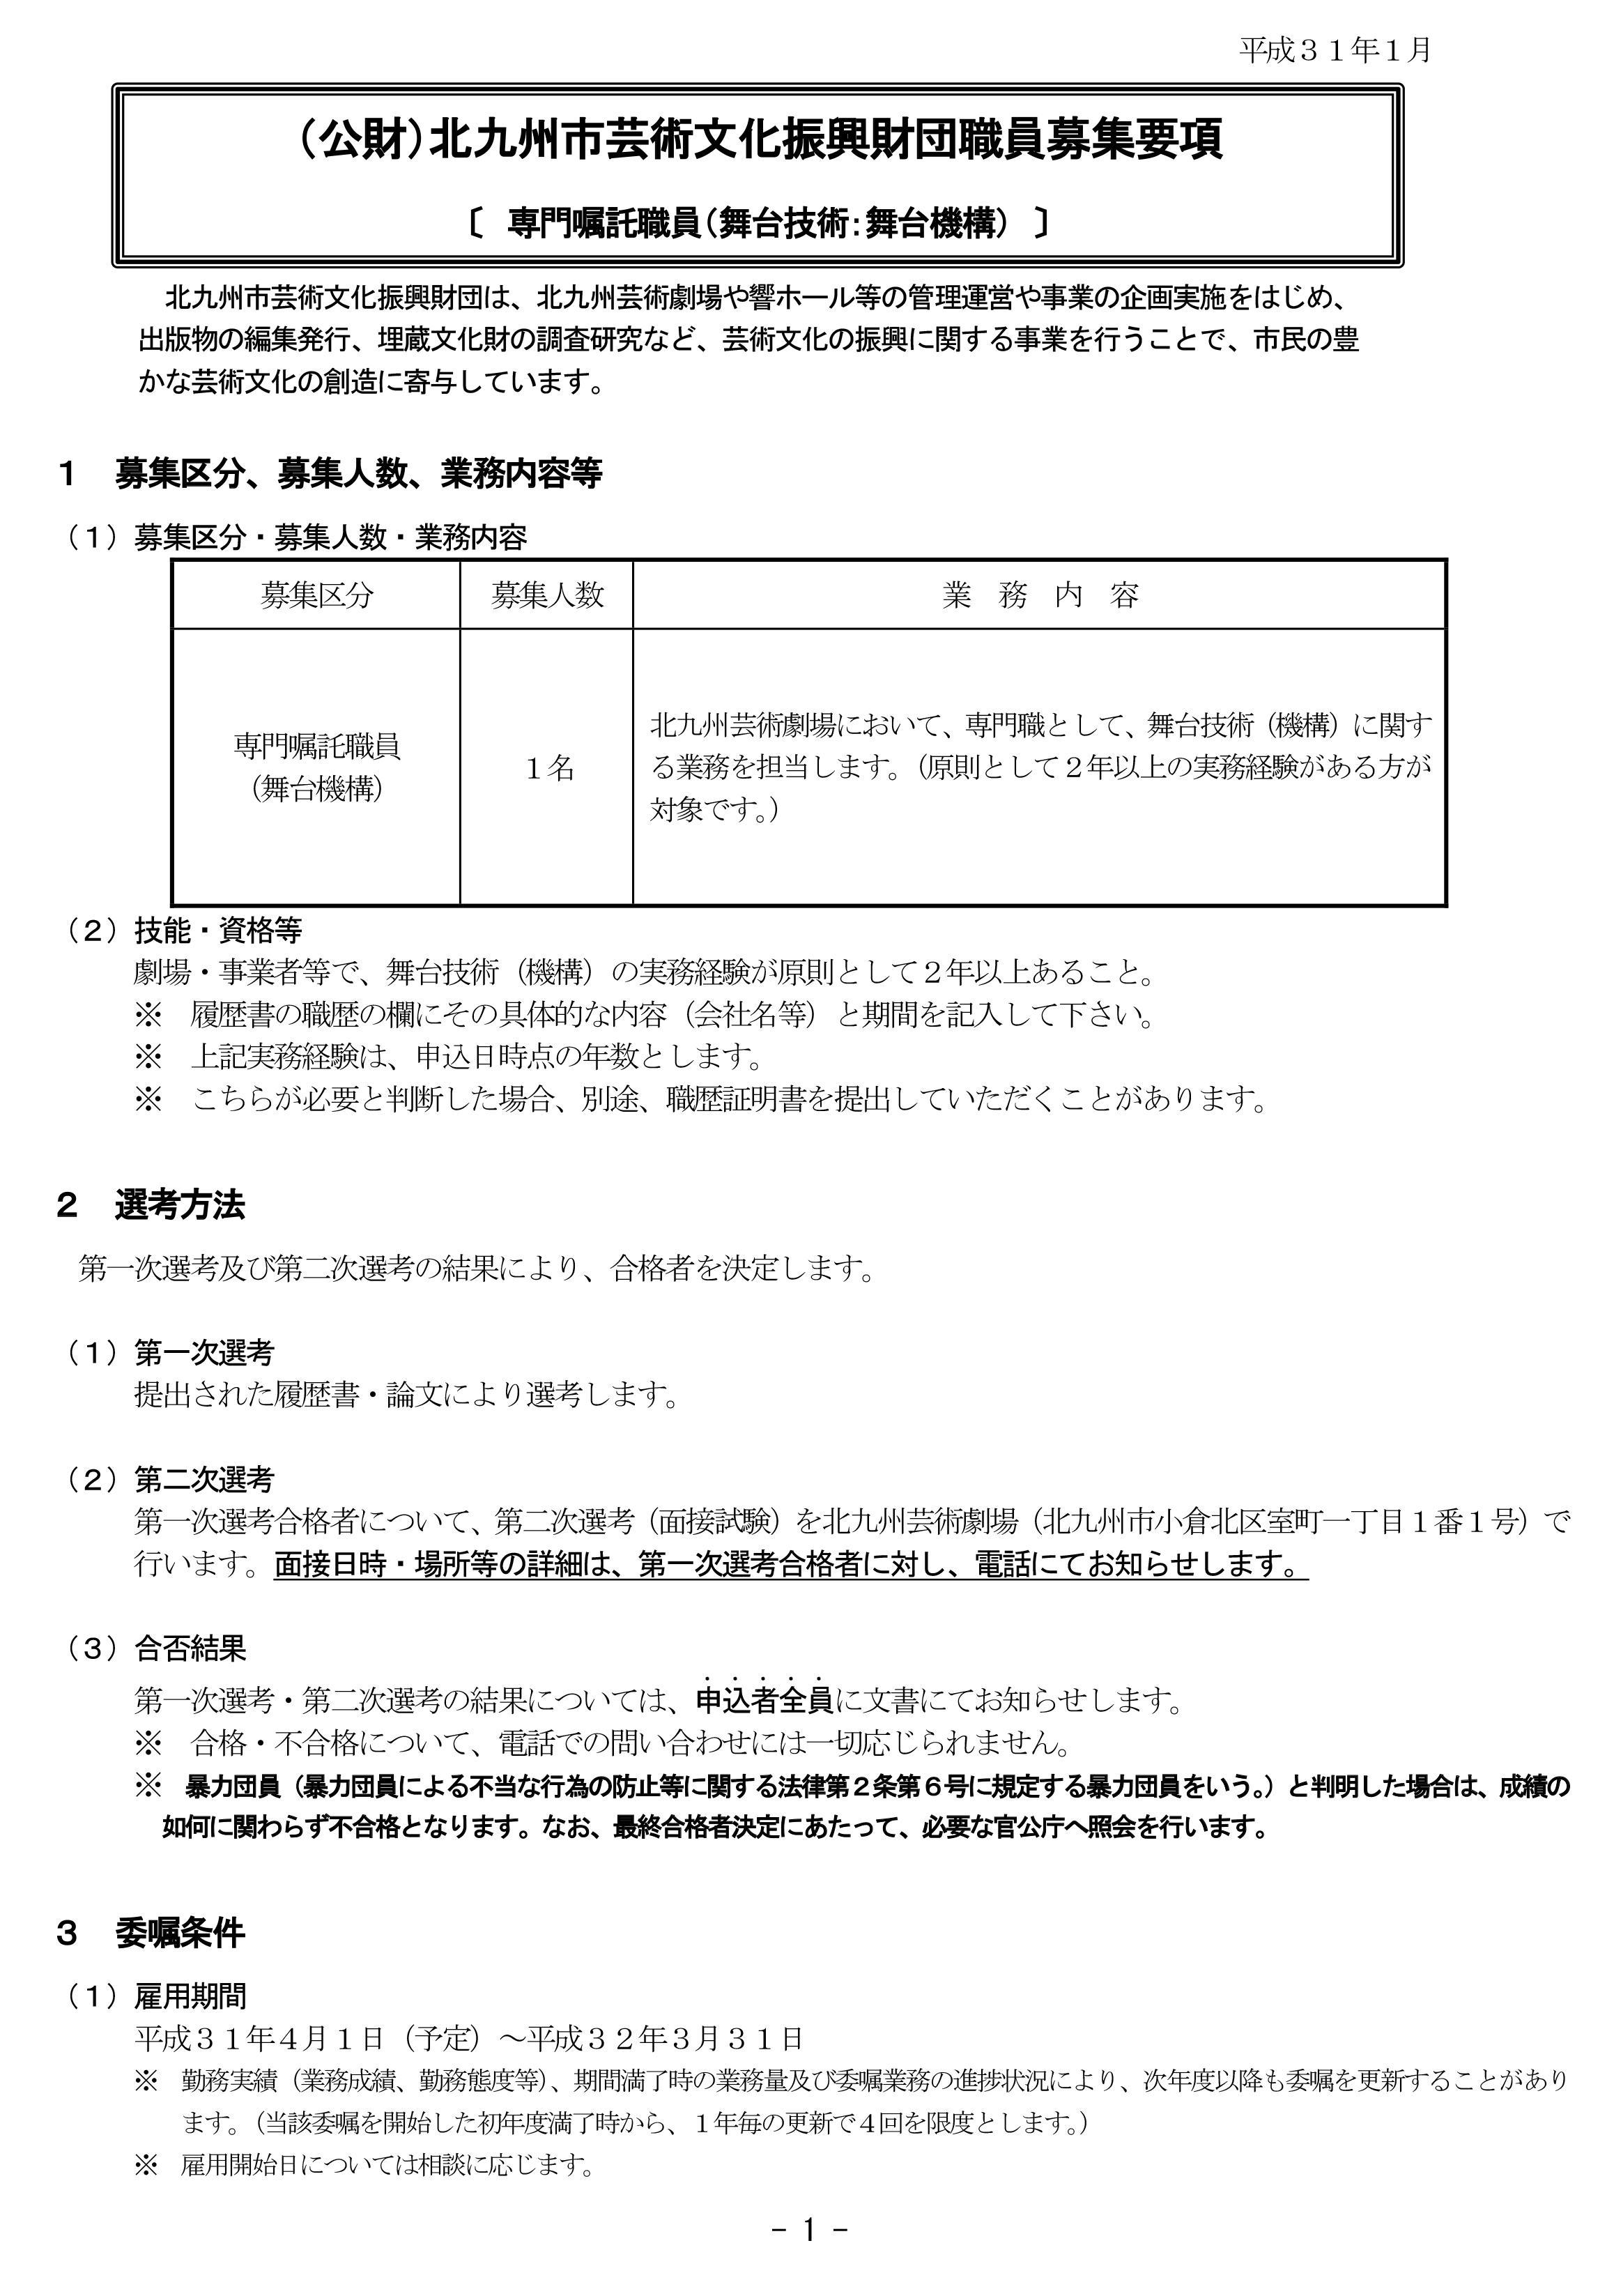 h31_kikou_youkou1.jpg